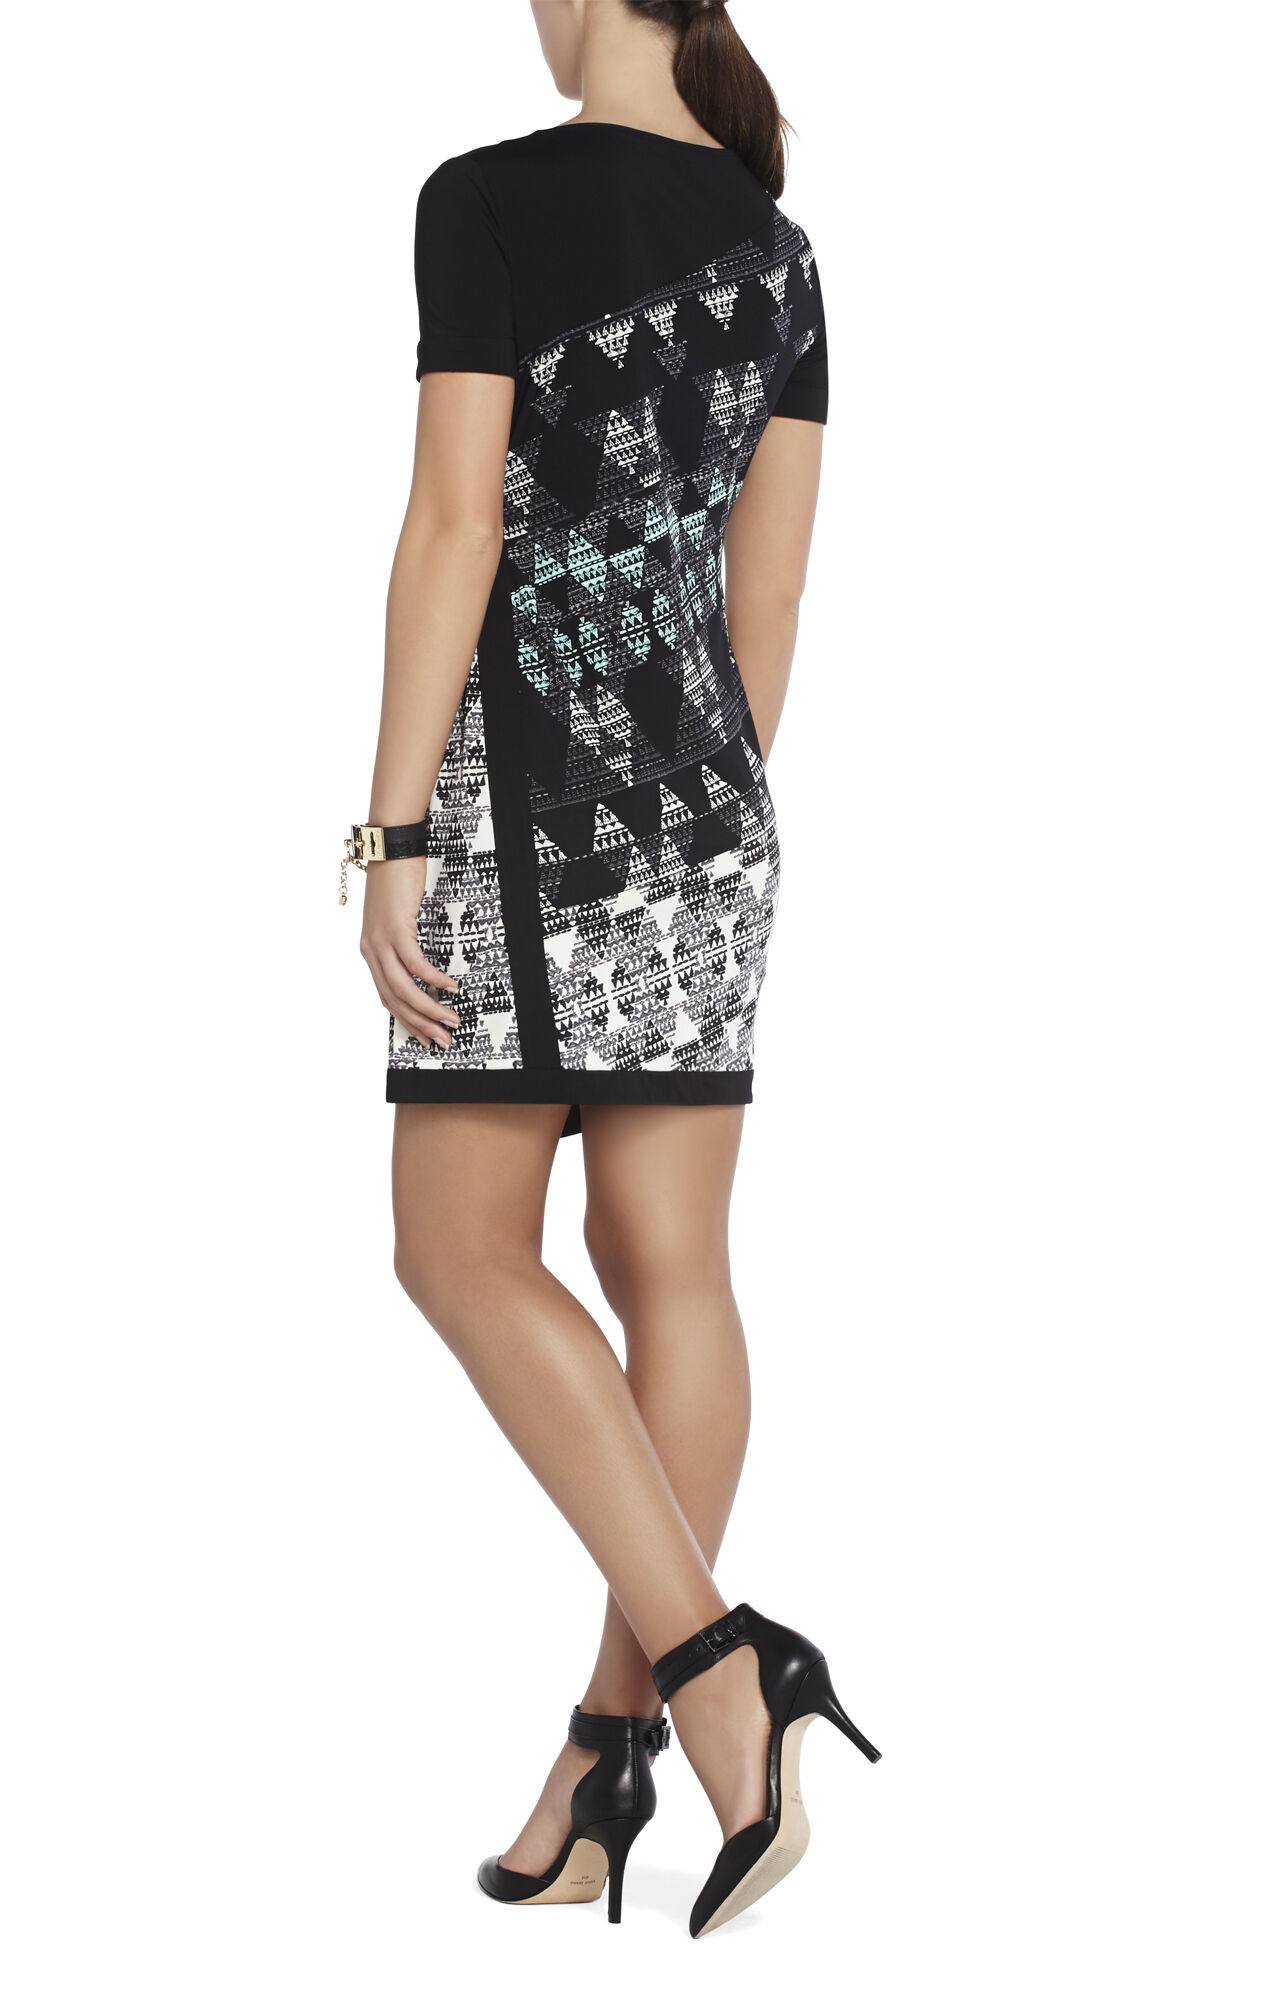 Kellan Print-Blocked Shift Dress